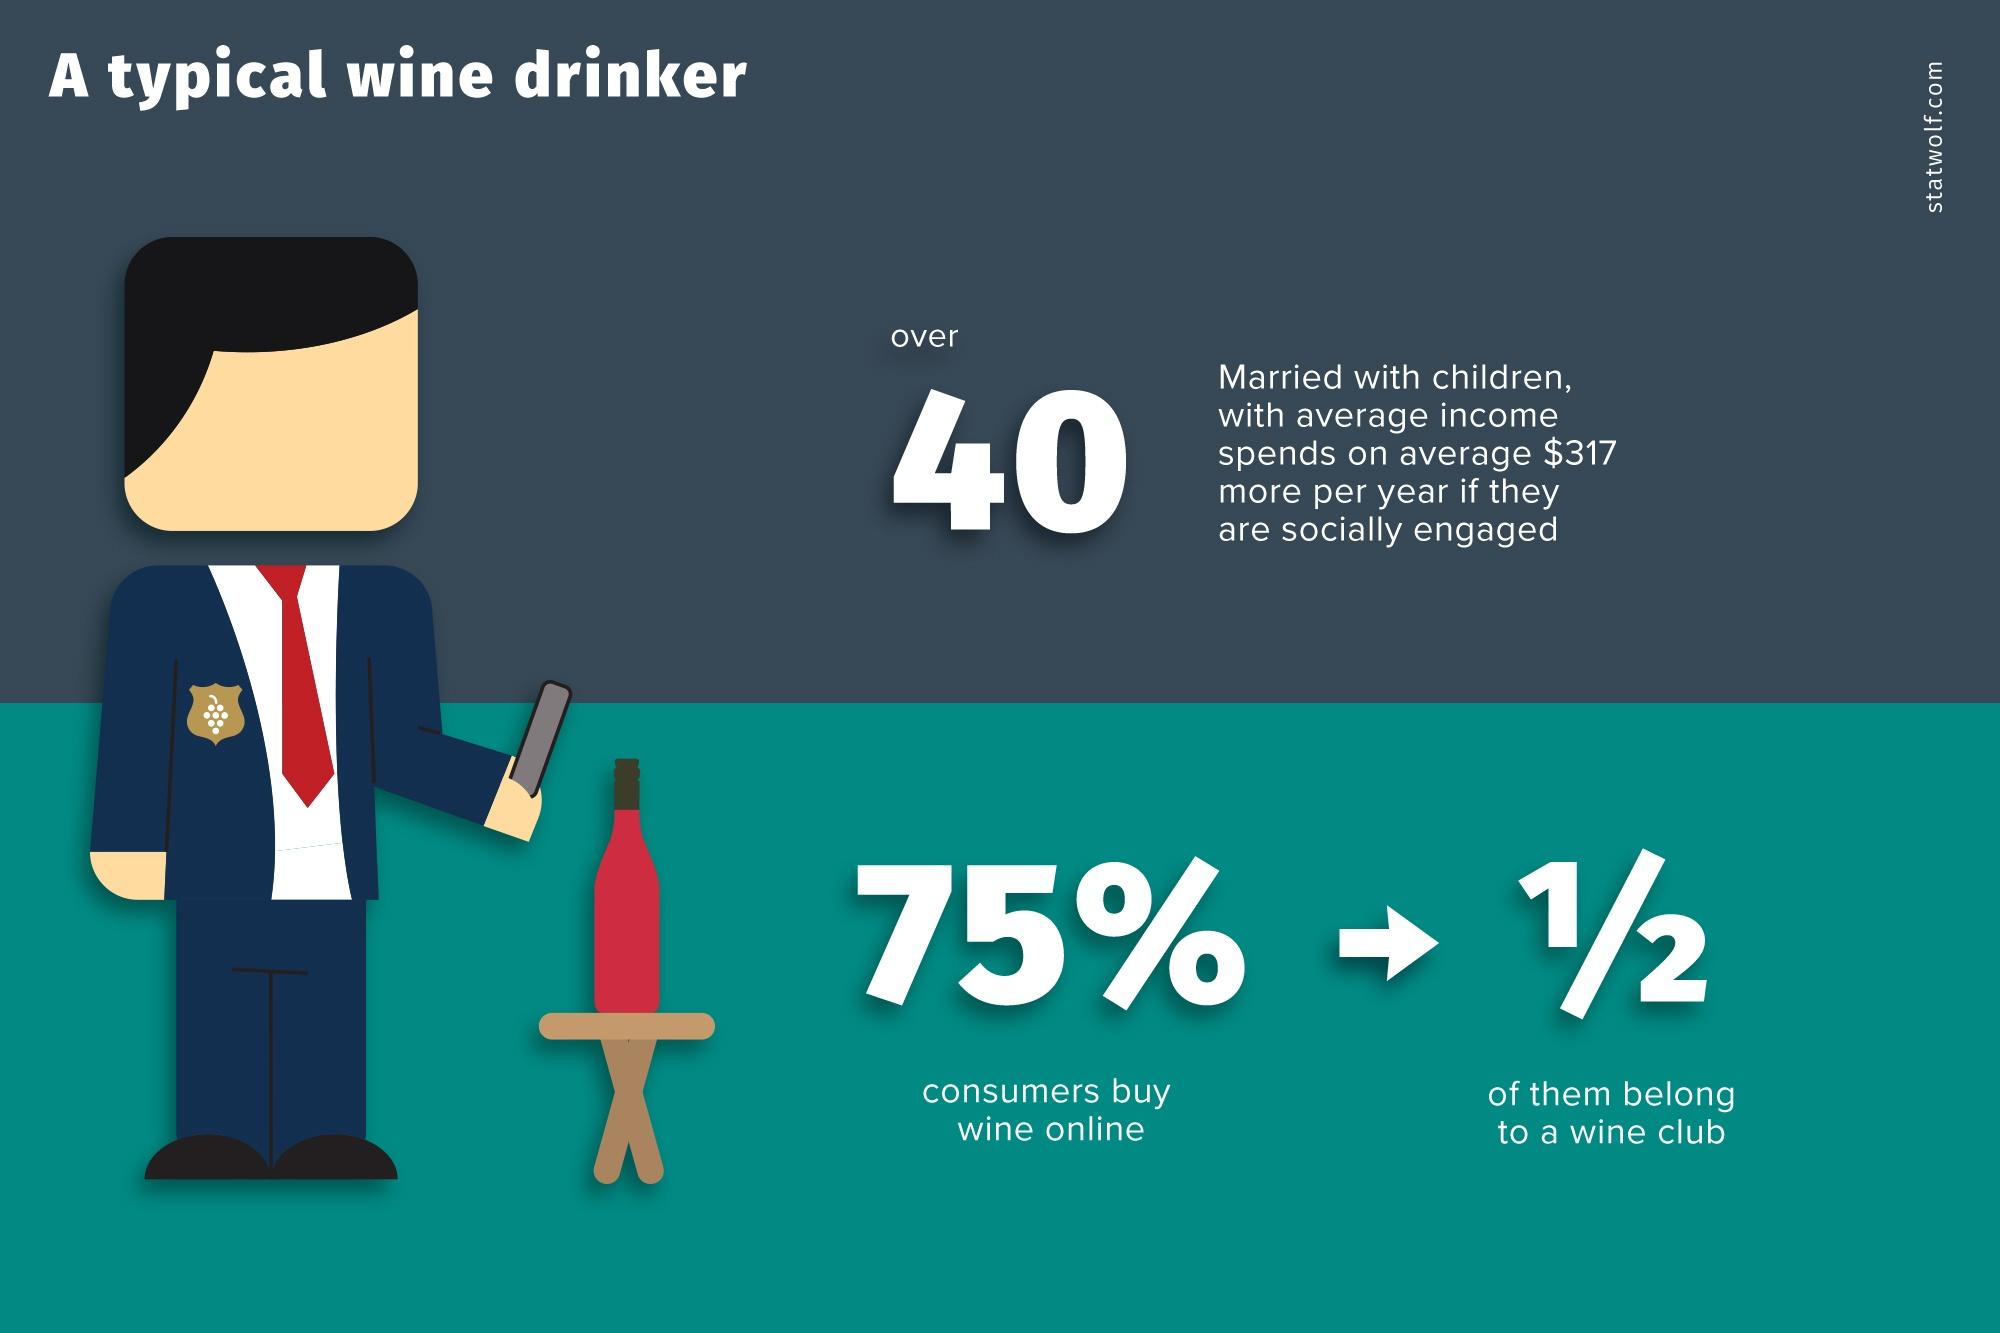 A Typical Wine Drinker